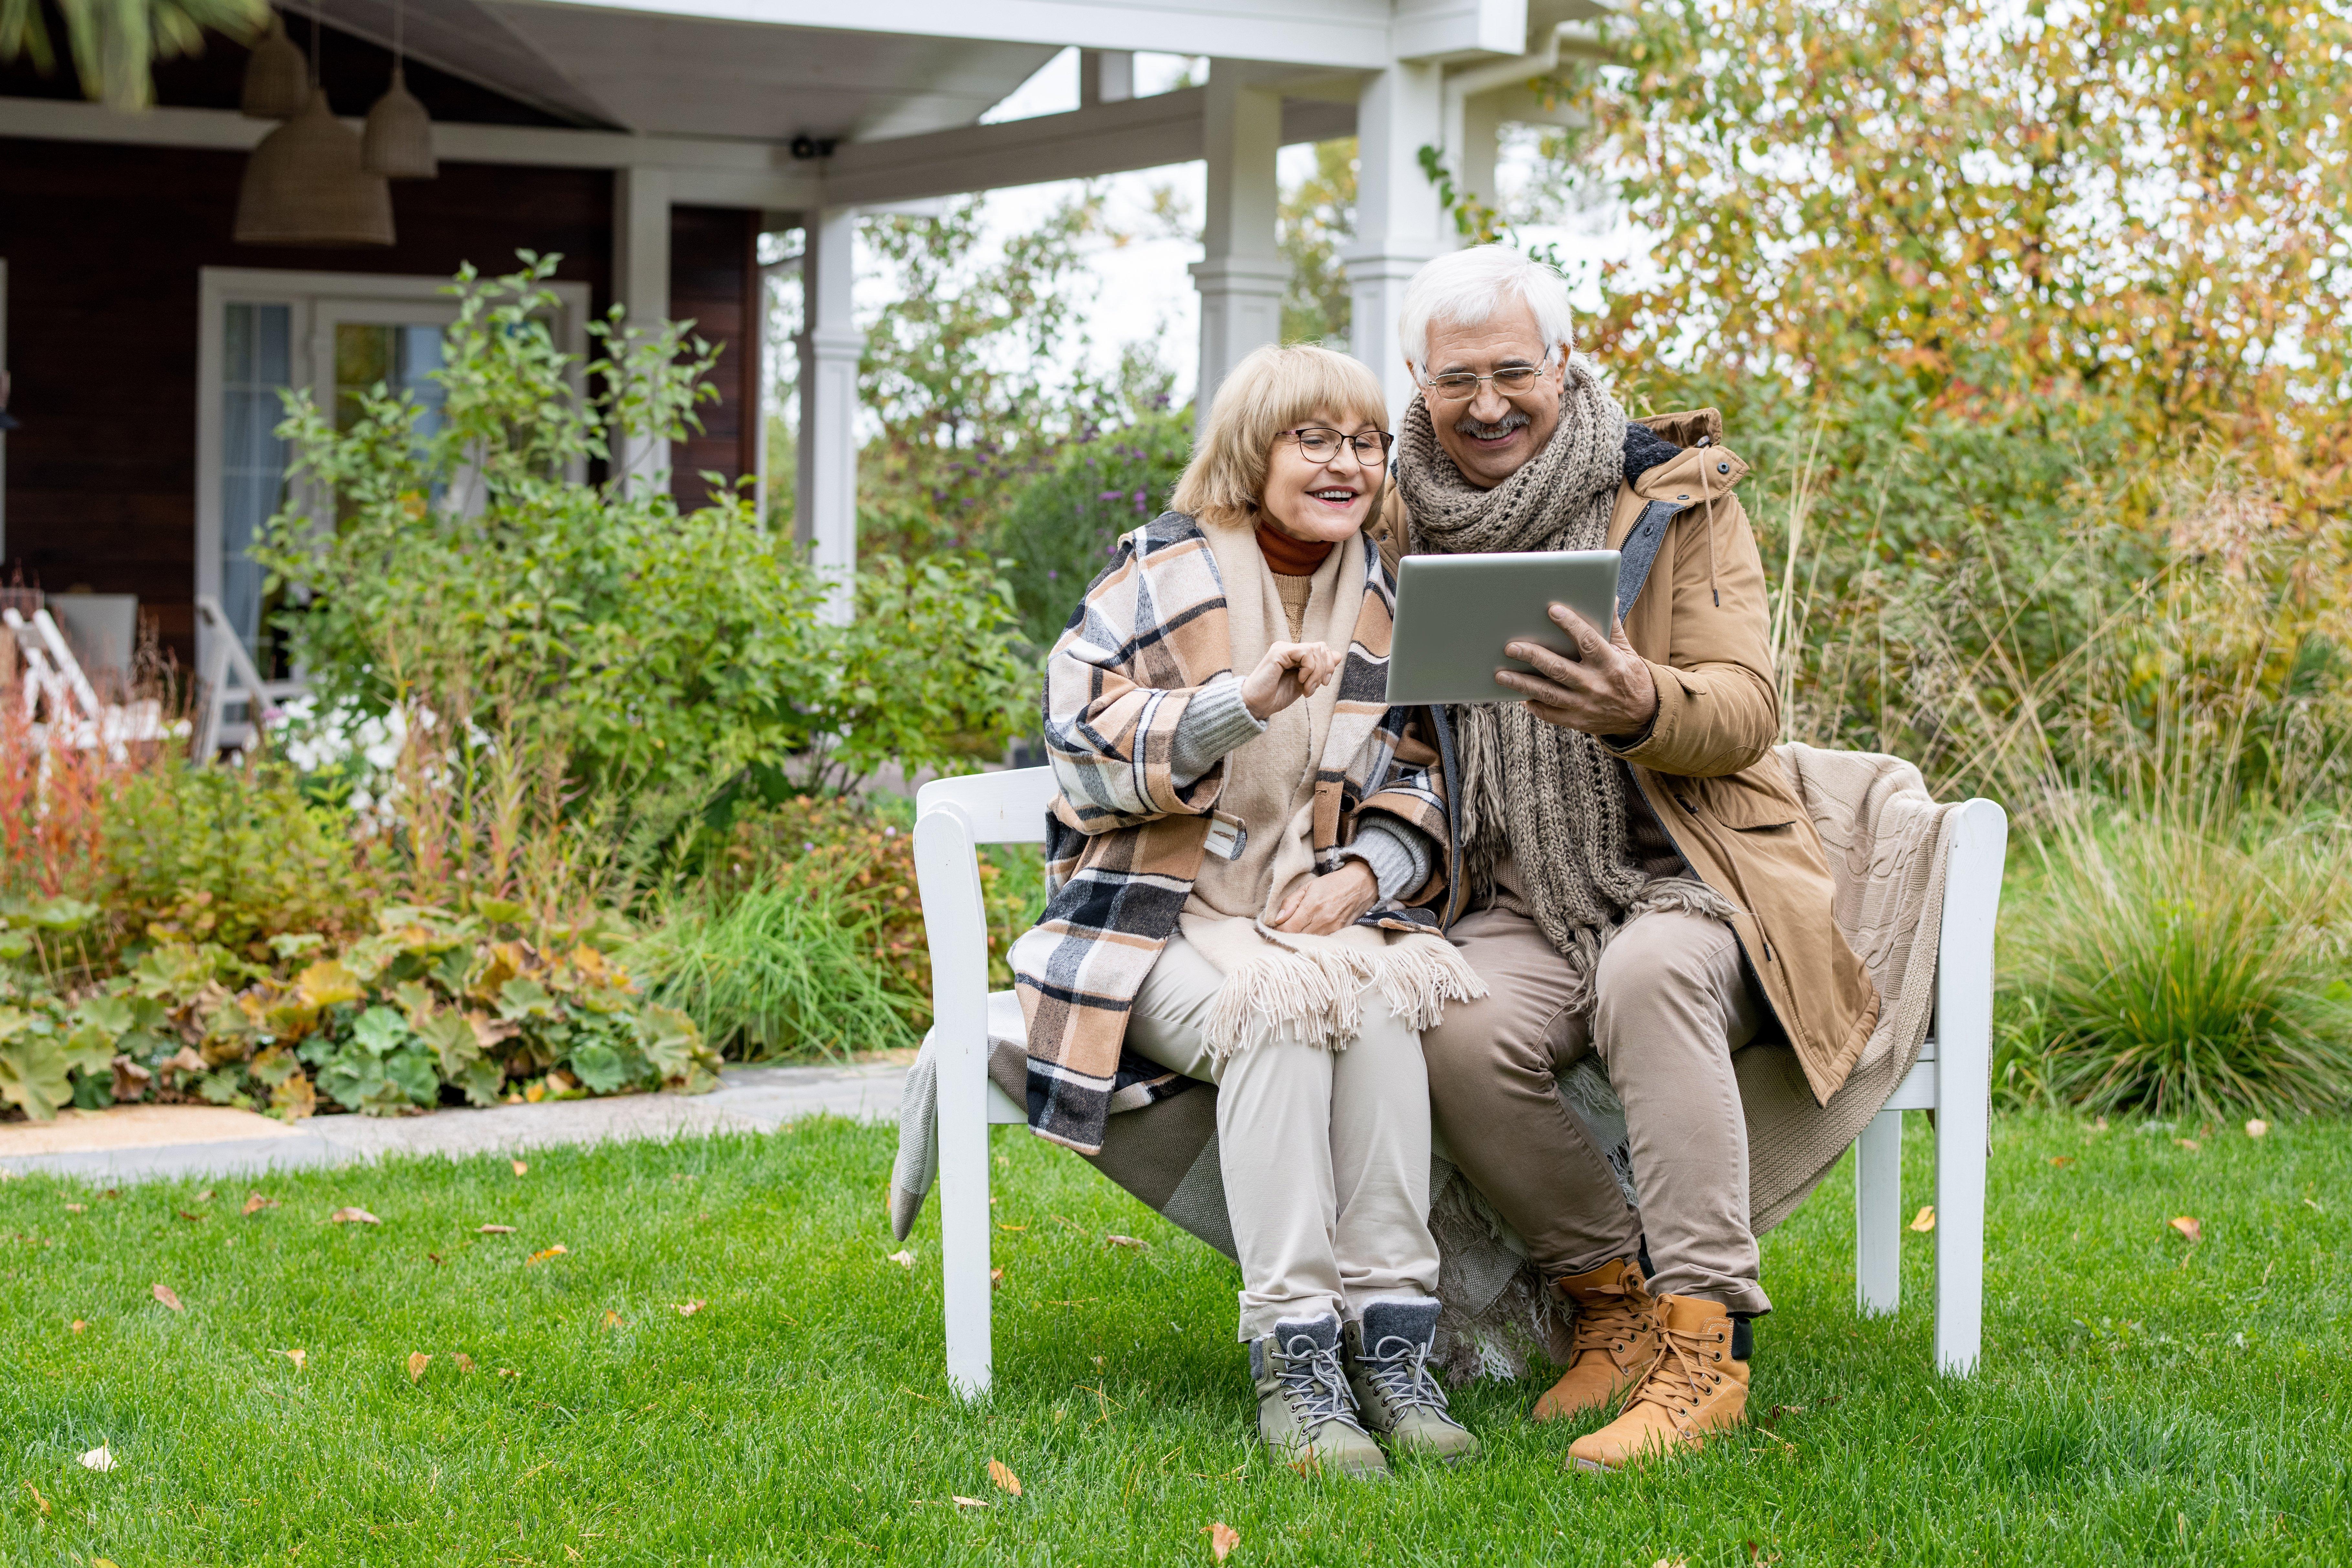 People-Couple-Older-iStock-1279494525